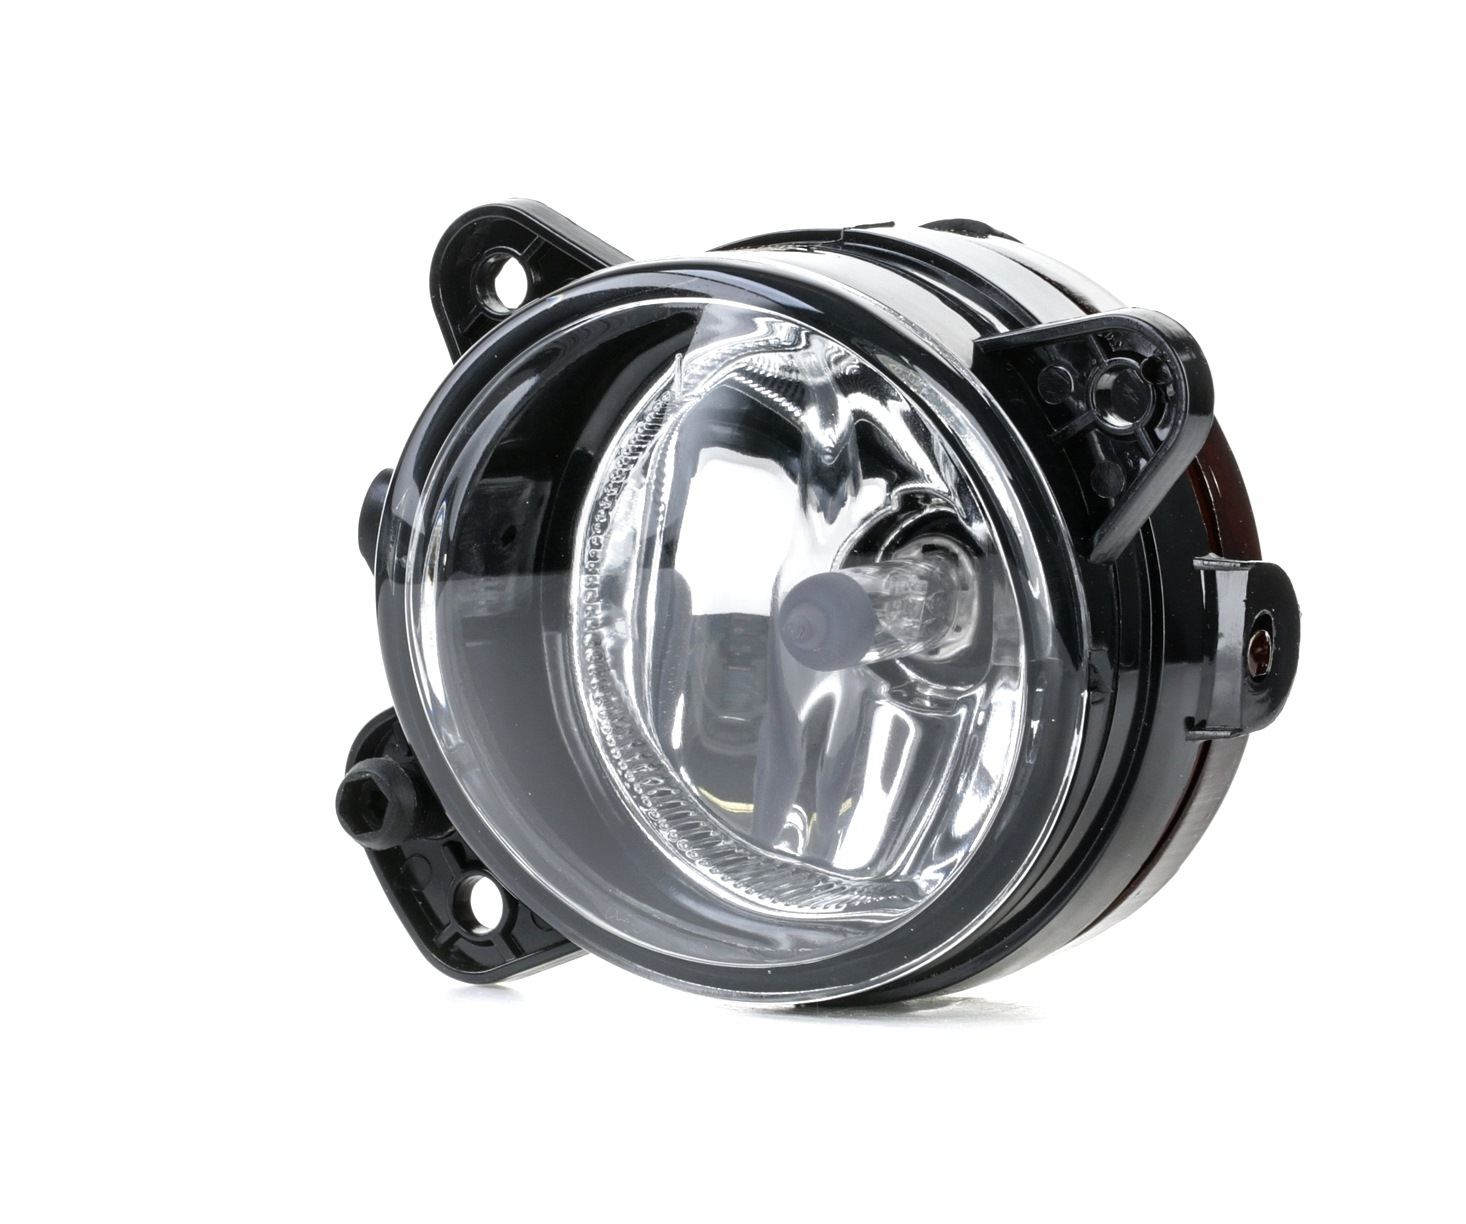 Nebelscheinwerfer DPA 89410228202 Bewertung